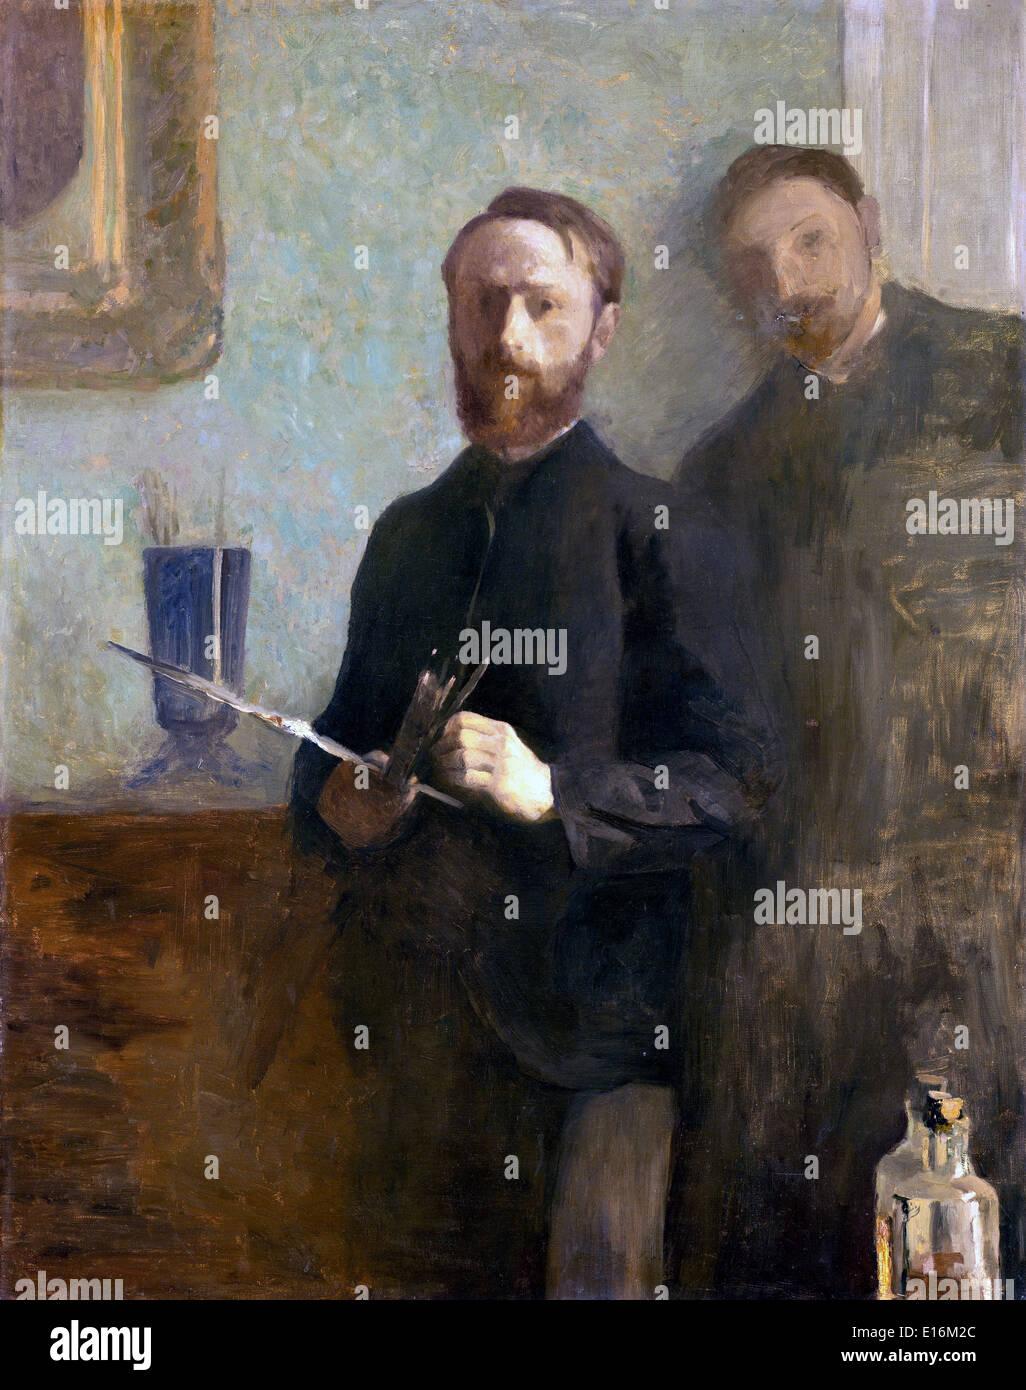 Self-Portrait with Waroquy Edouard Vuillard, 1889 - Stock Image